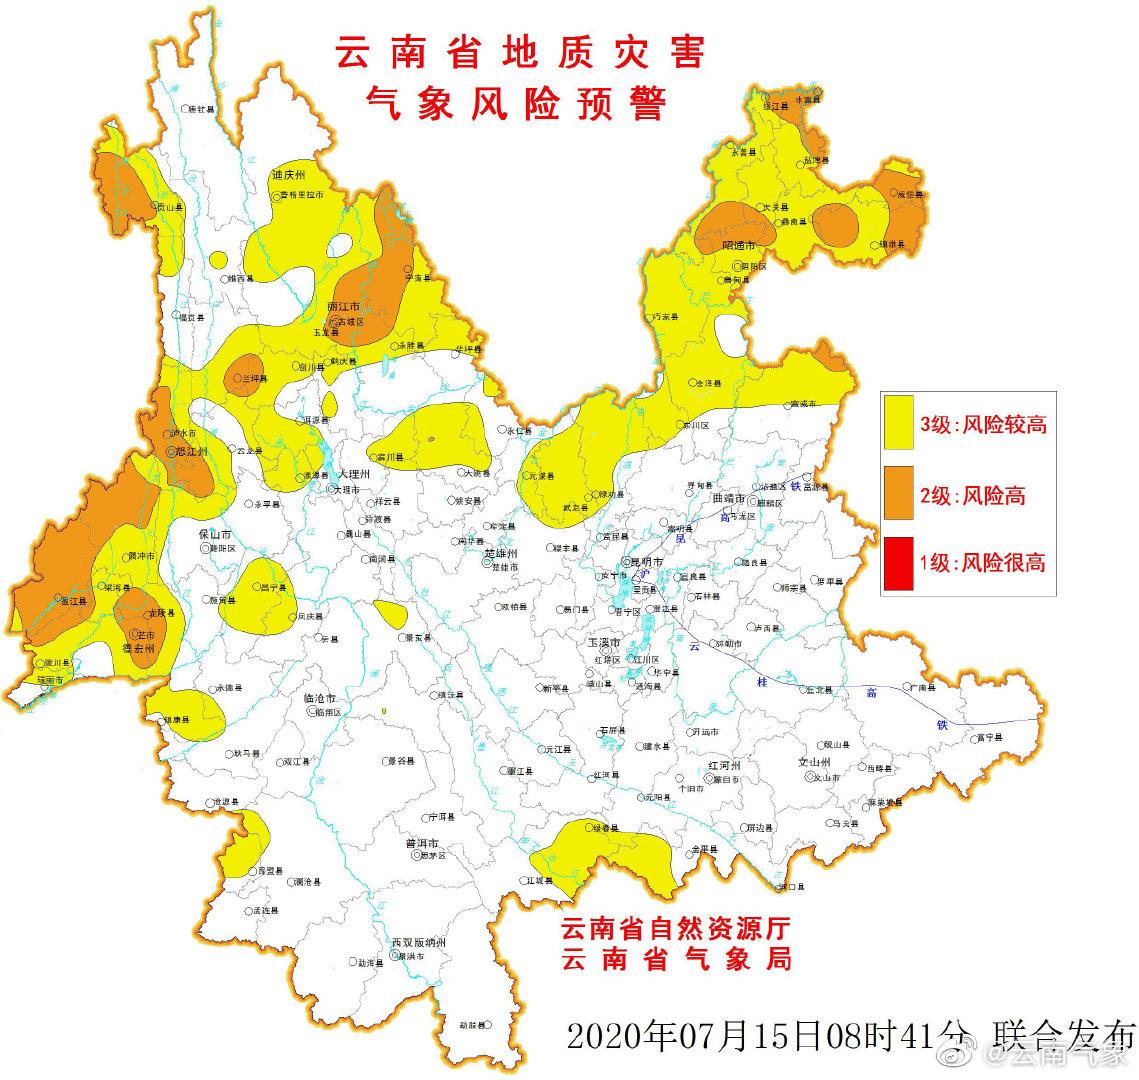 [sky平台注册]续六sky平台注册天发布地质灾害图片